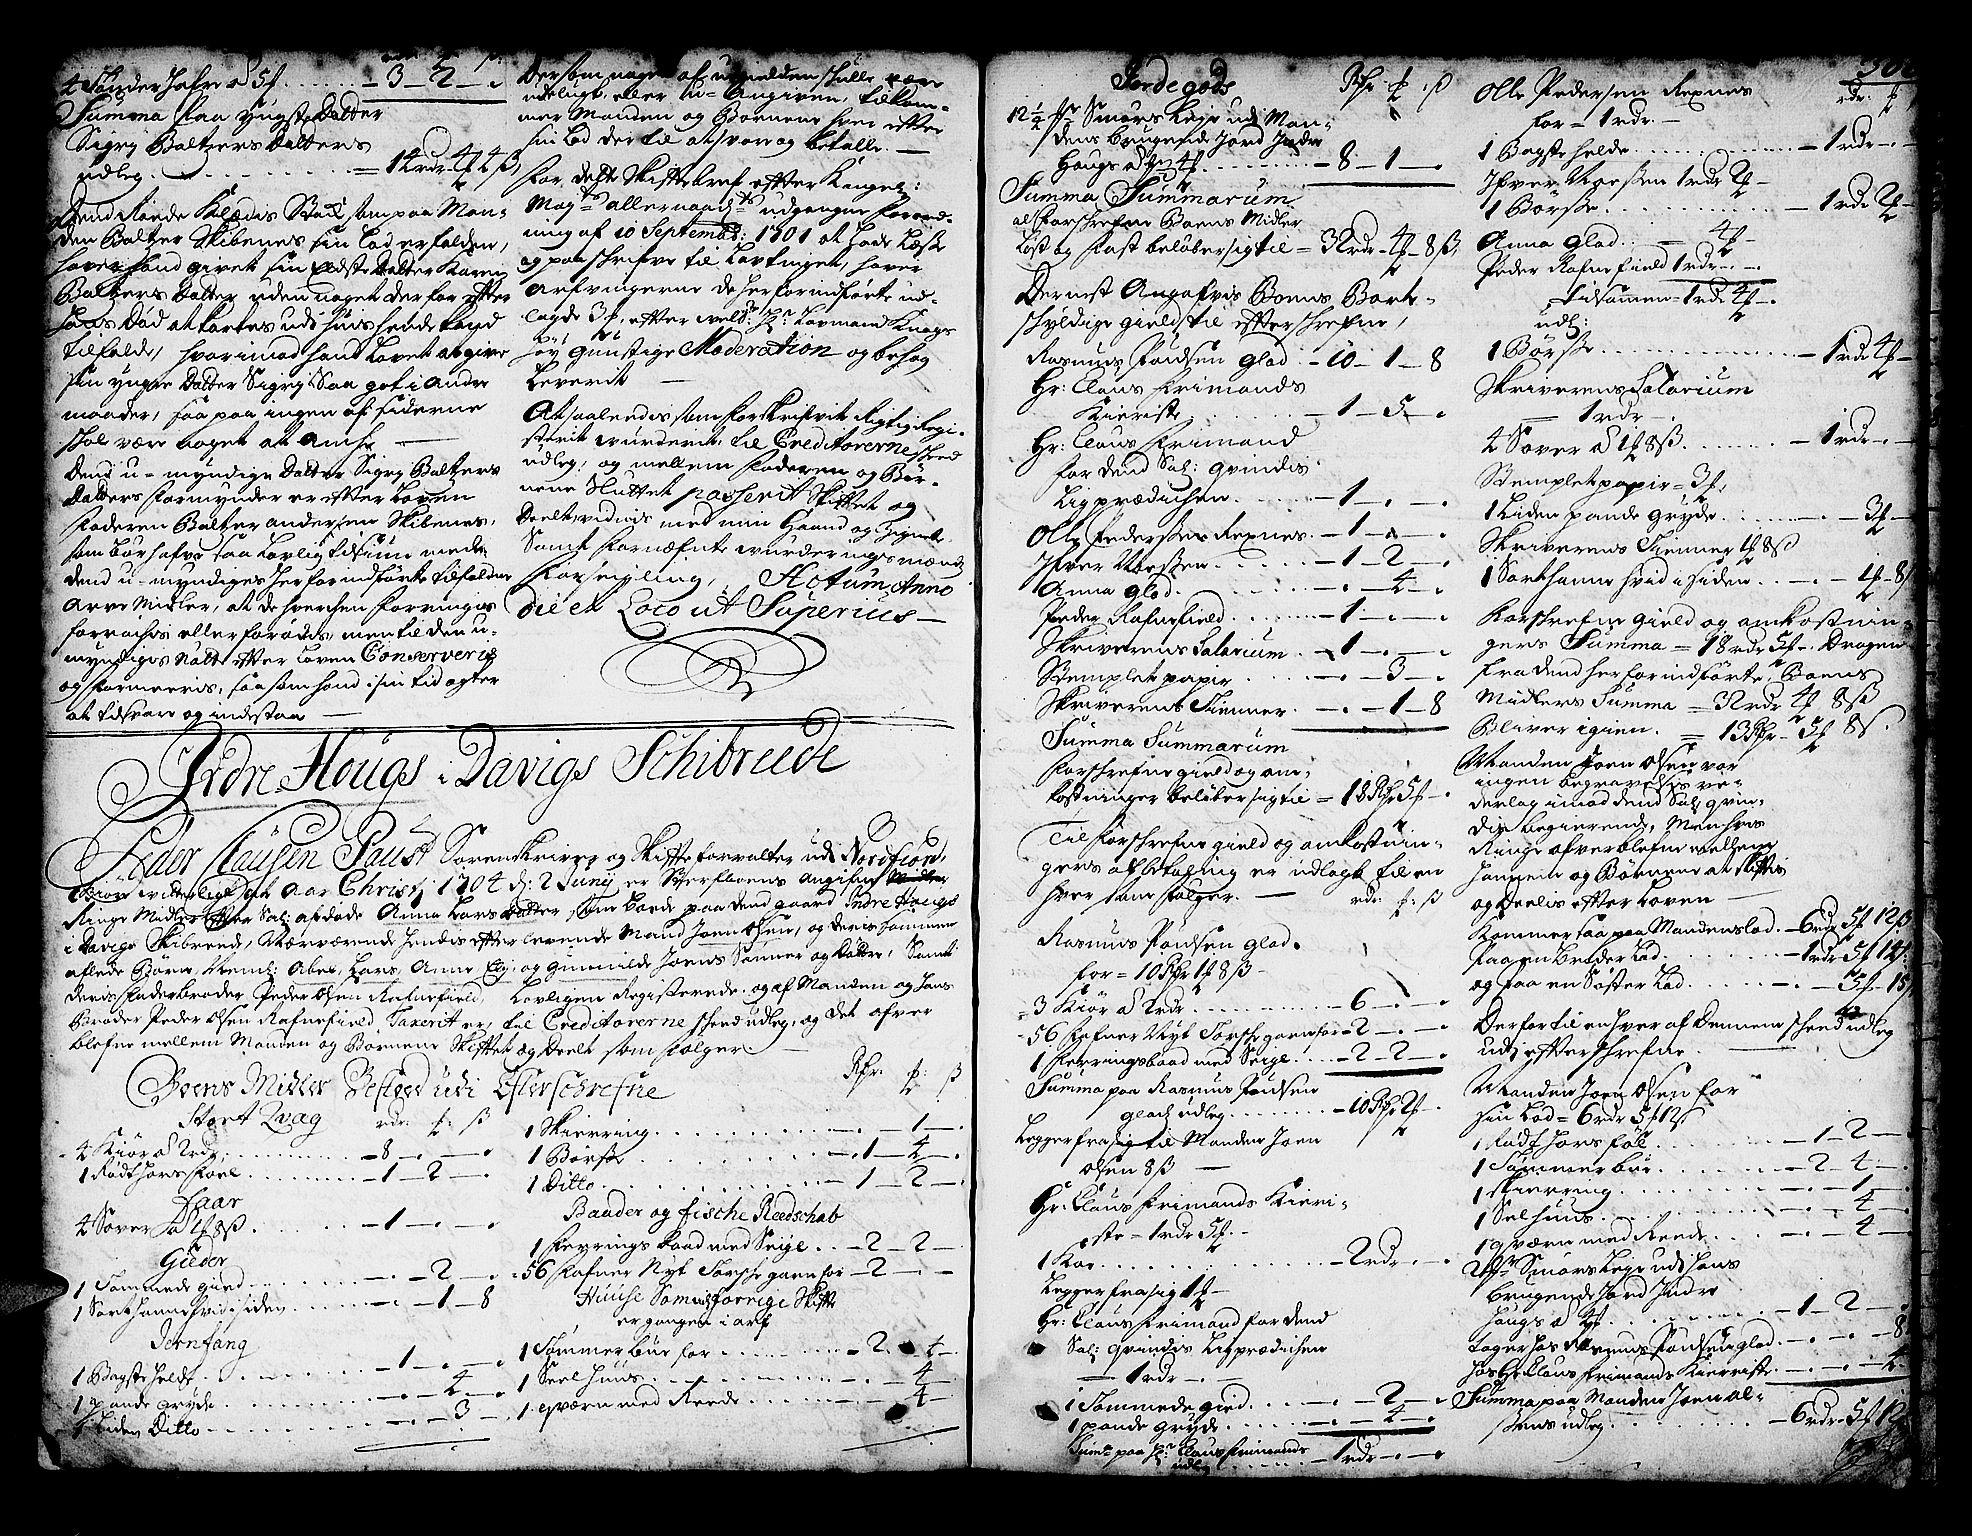 SAB, Nordfjord sorenskriveri, 04/04a/L0002b: Skifteprotokollar, 1702-1704, s. 365b-366a